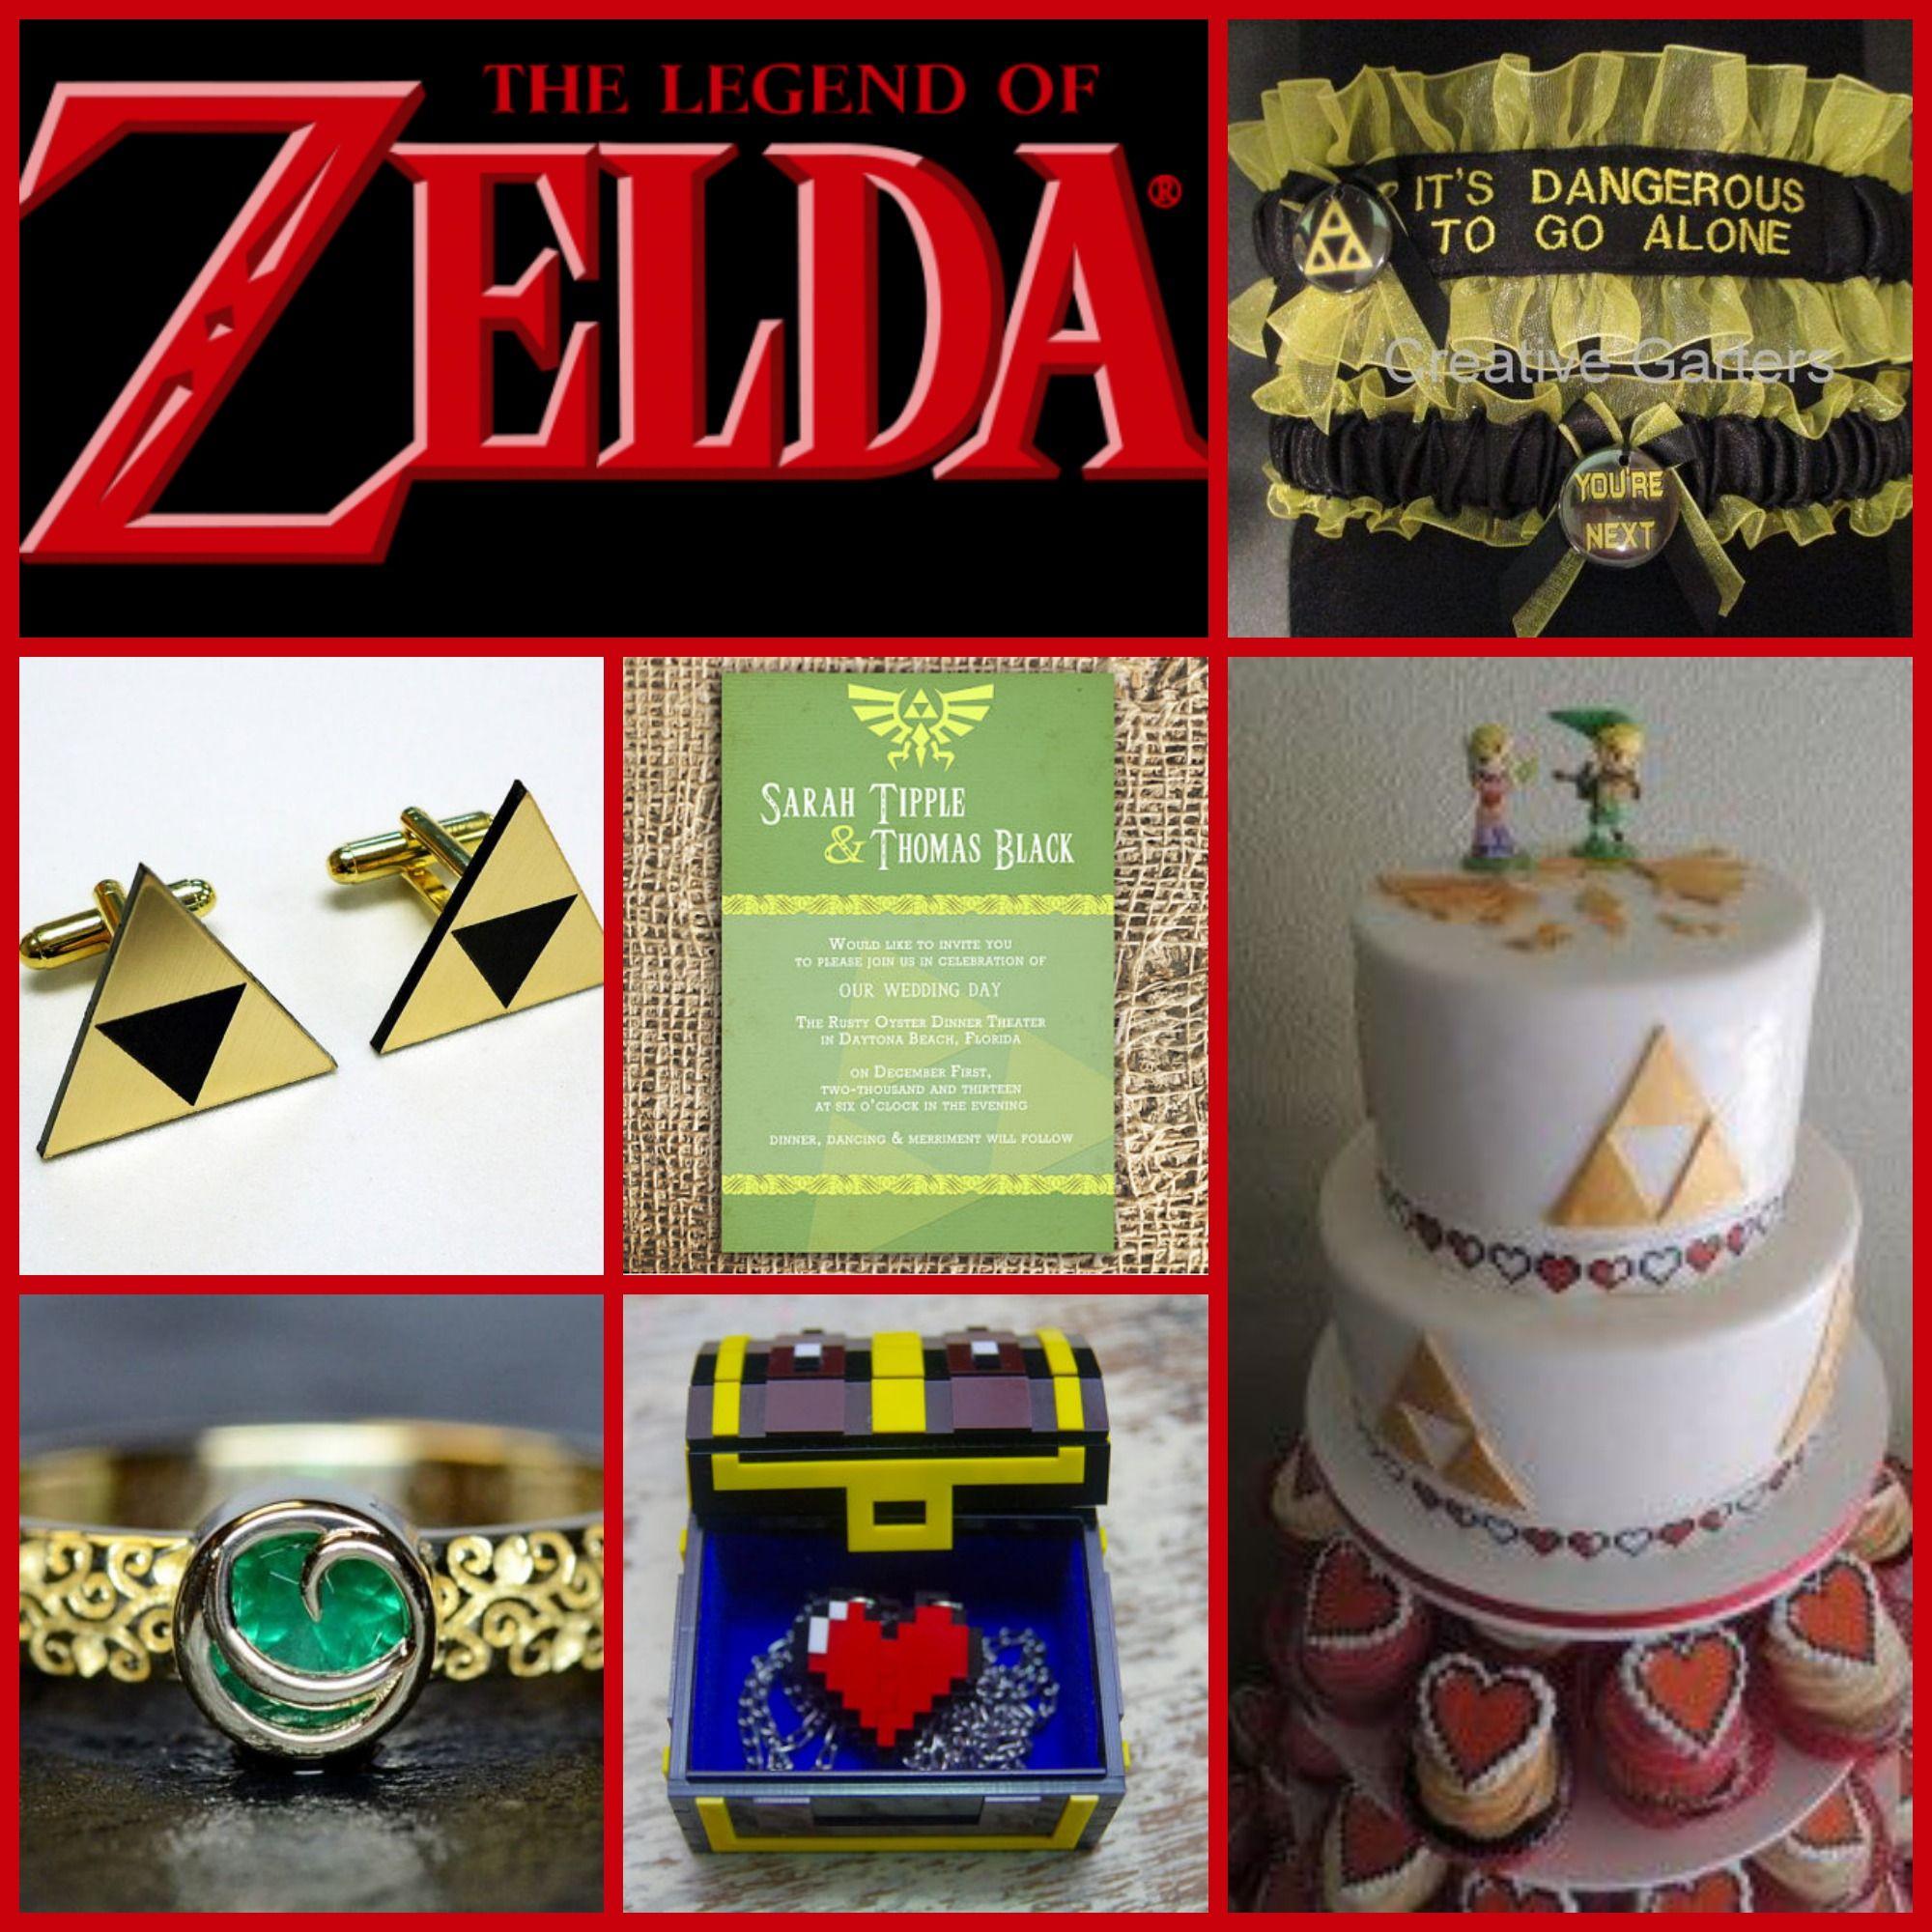 ideas nerdy wedding invitations furoshikiforum wedding dress and the 15 most delightfully geeky wedding invitations dorkly post the 15 most delightfully ge - Nerdy Wedding Invitations